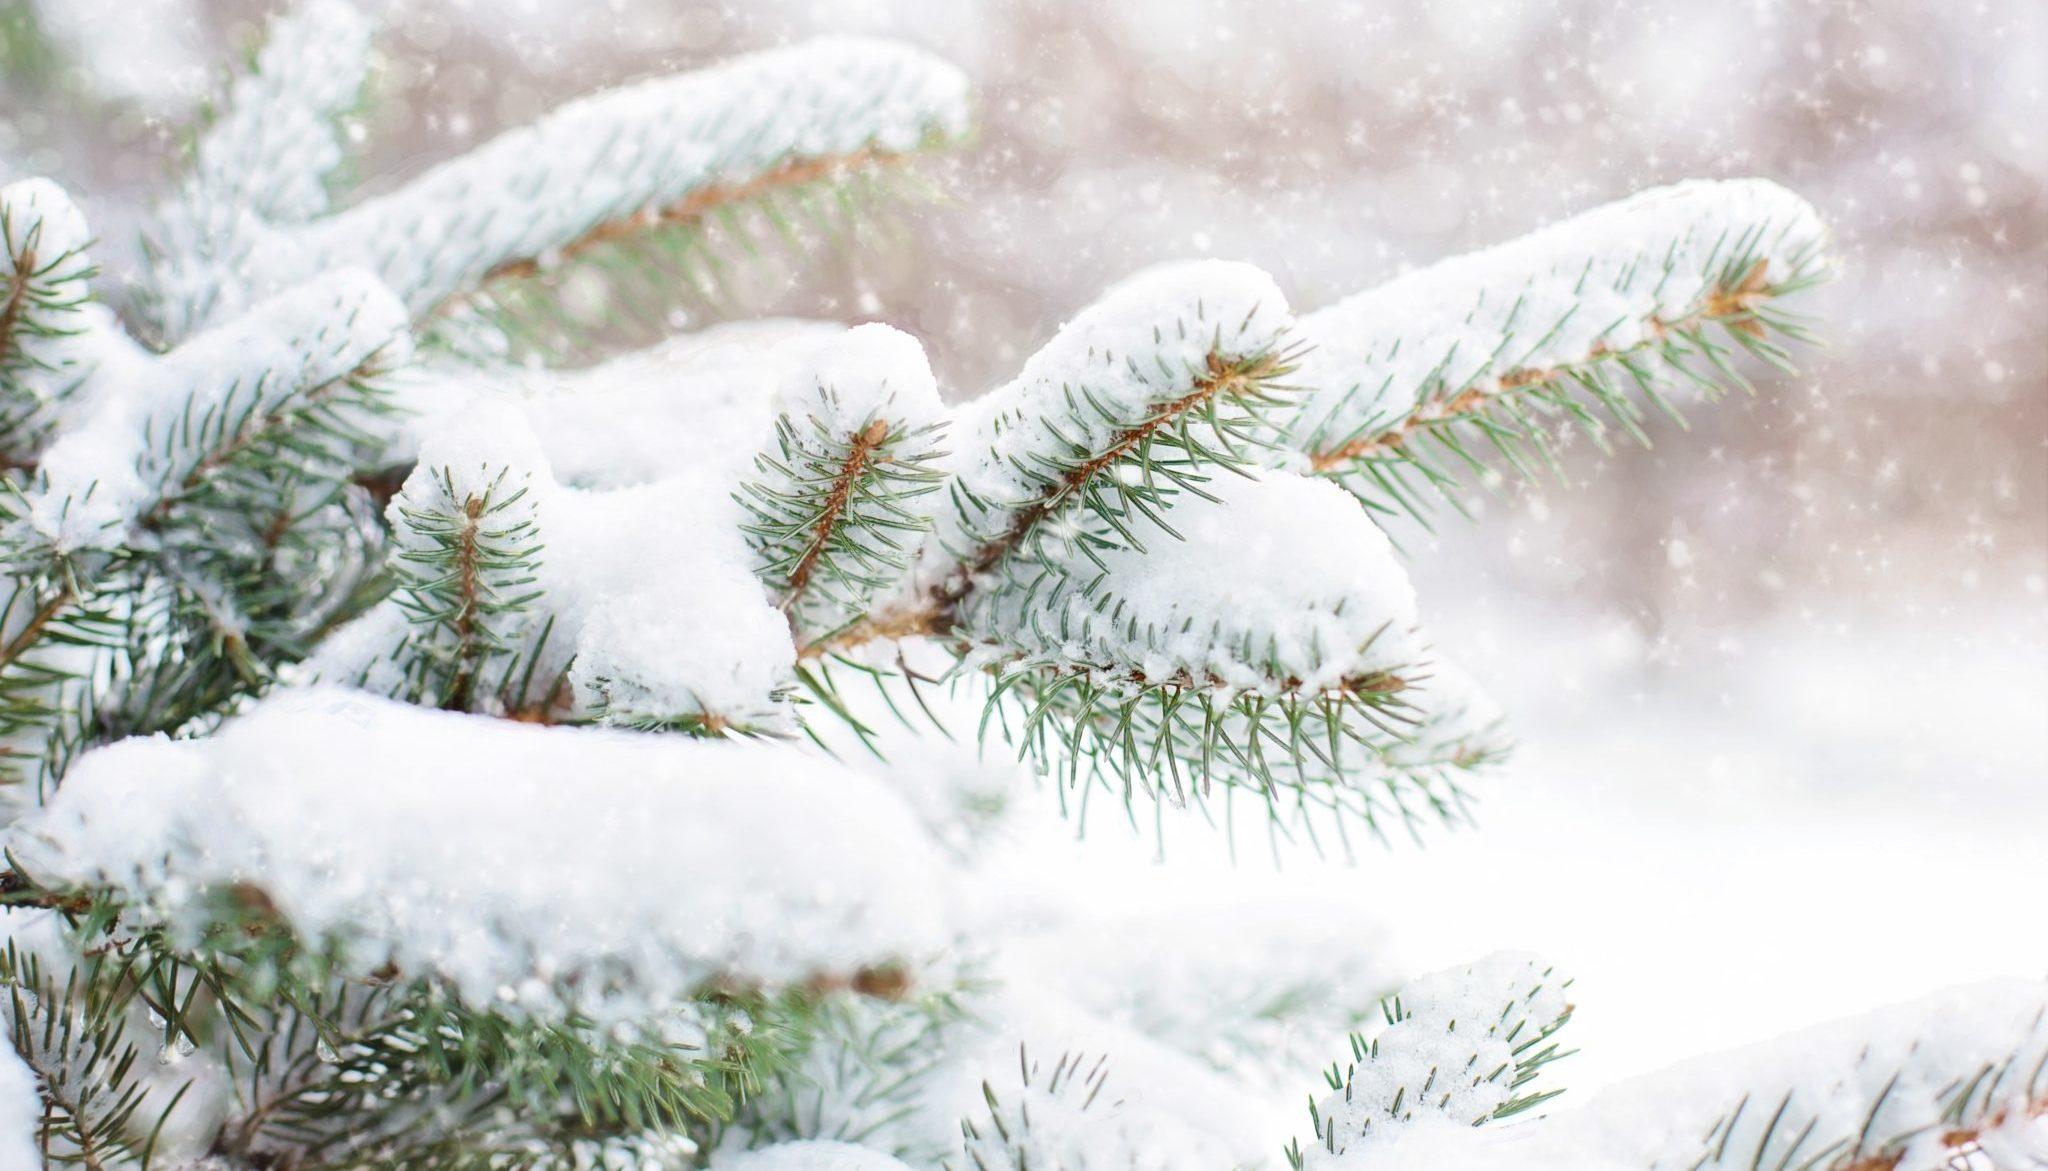 snow-covering-pine-tree-3334585